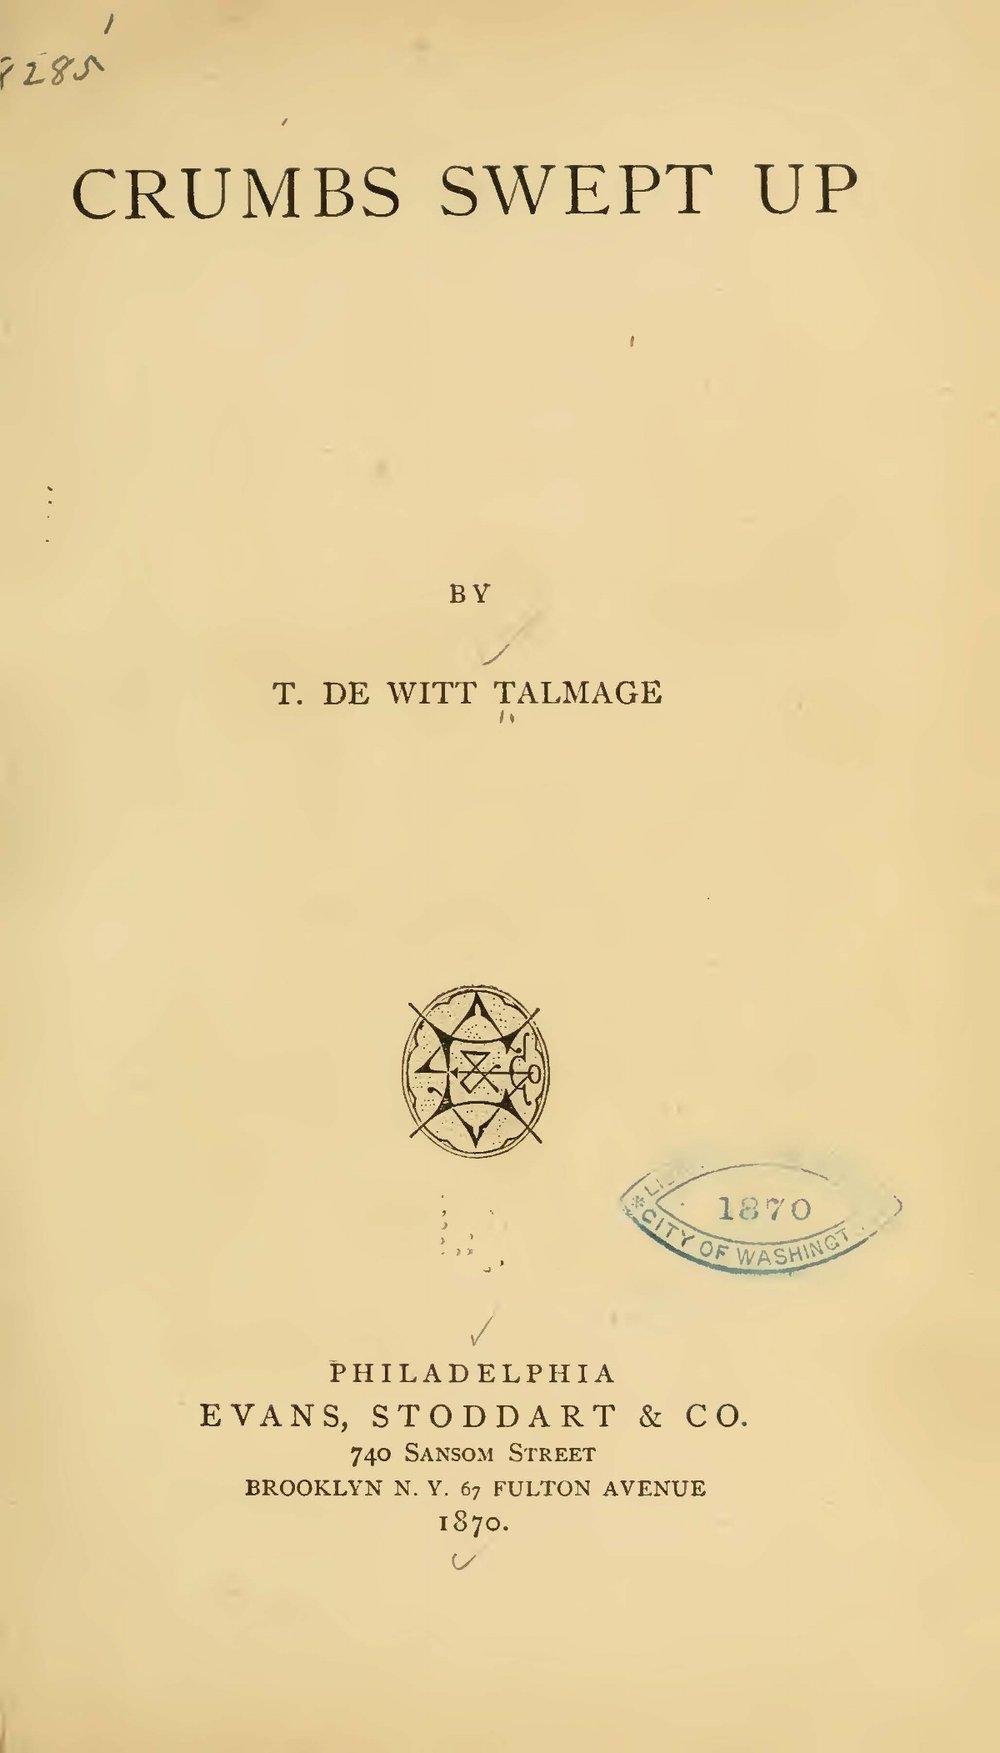 Talmage, Thomas De Witt, Crumbs Swept Up Title Page.jpg